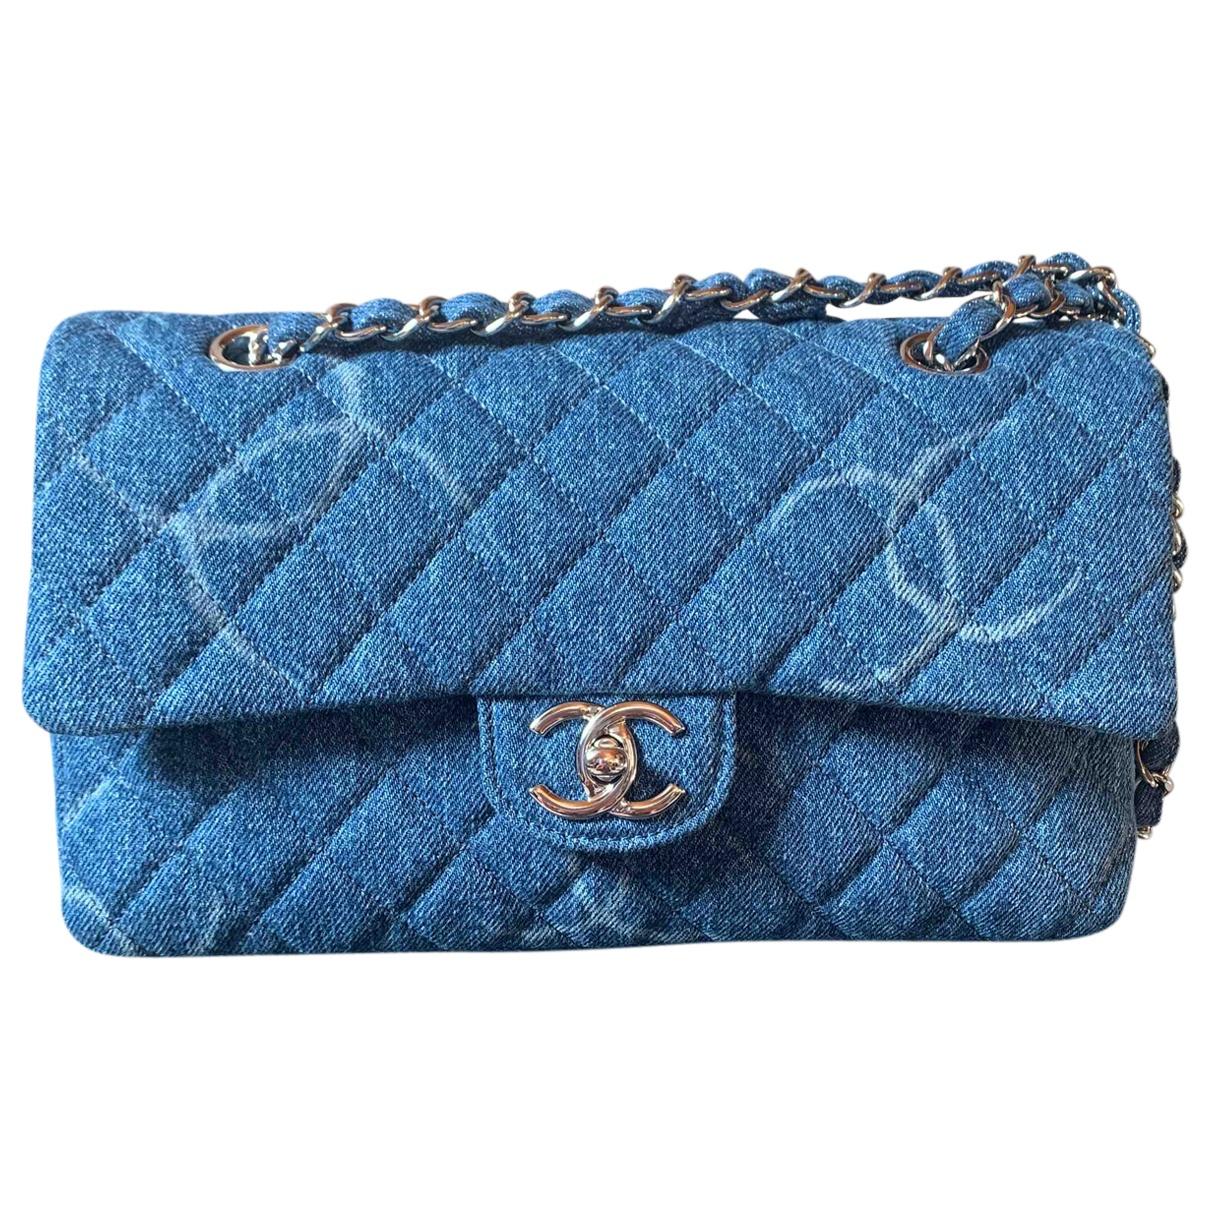 Bolsos clutch Timeless/Classique en Denim - Vaquero Azul Chanel